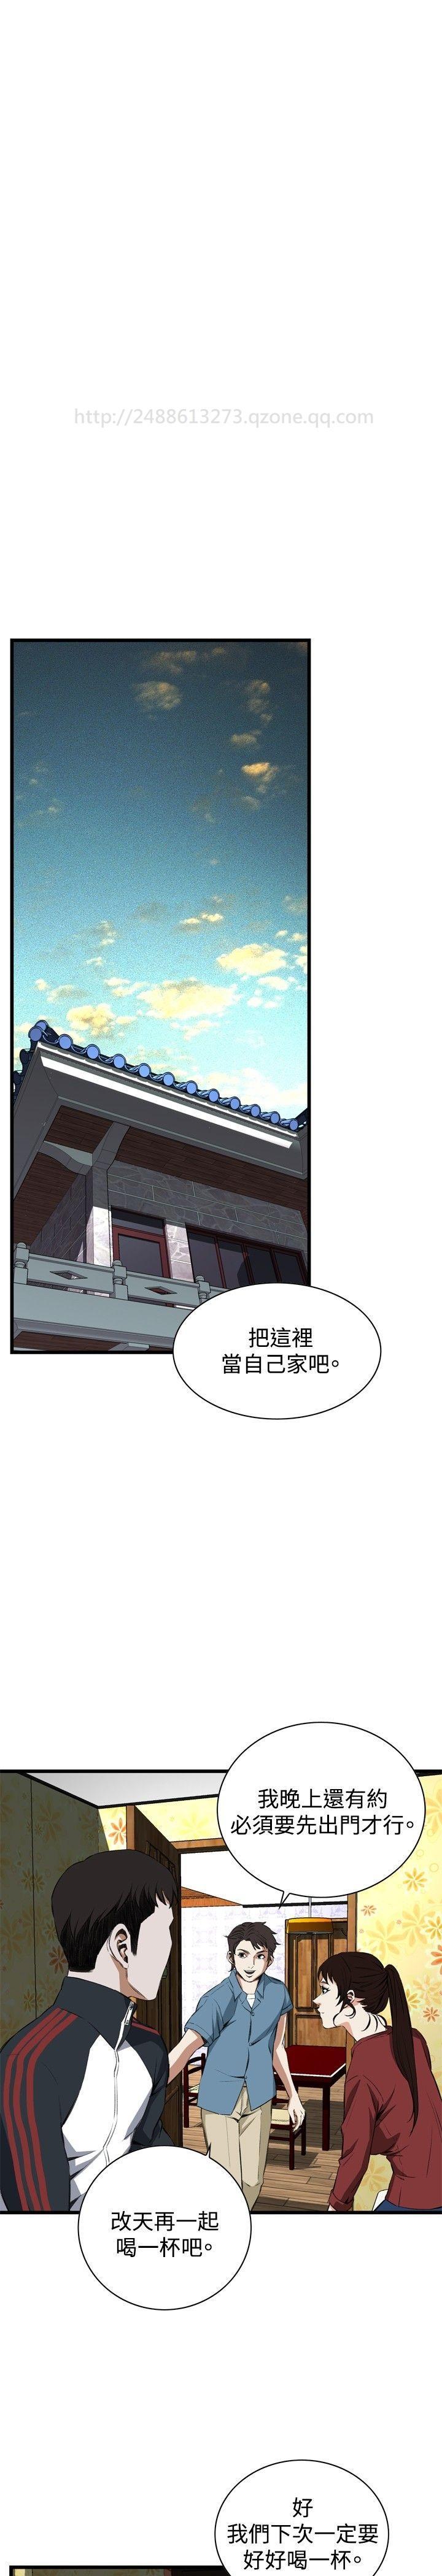 Take a Peek 偷窥 Ch.39~60 [Chinese]中文 545